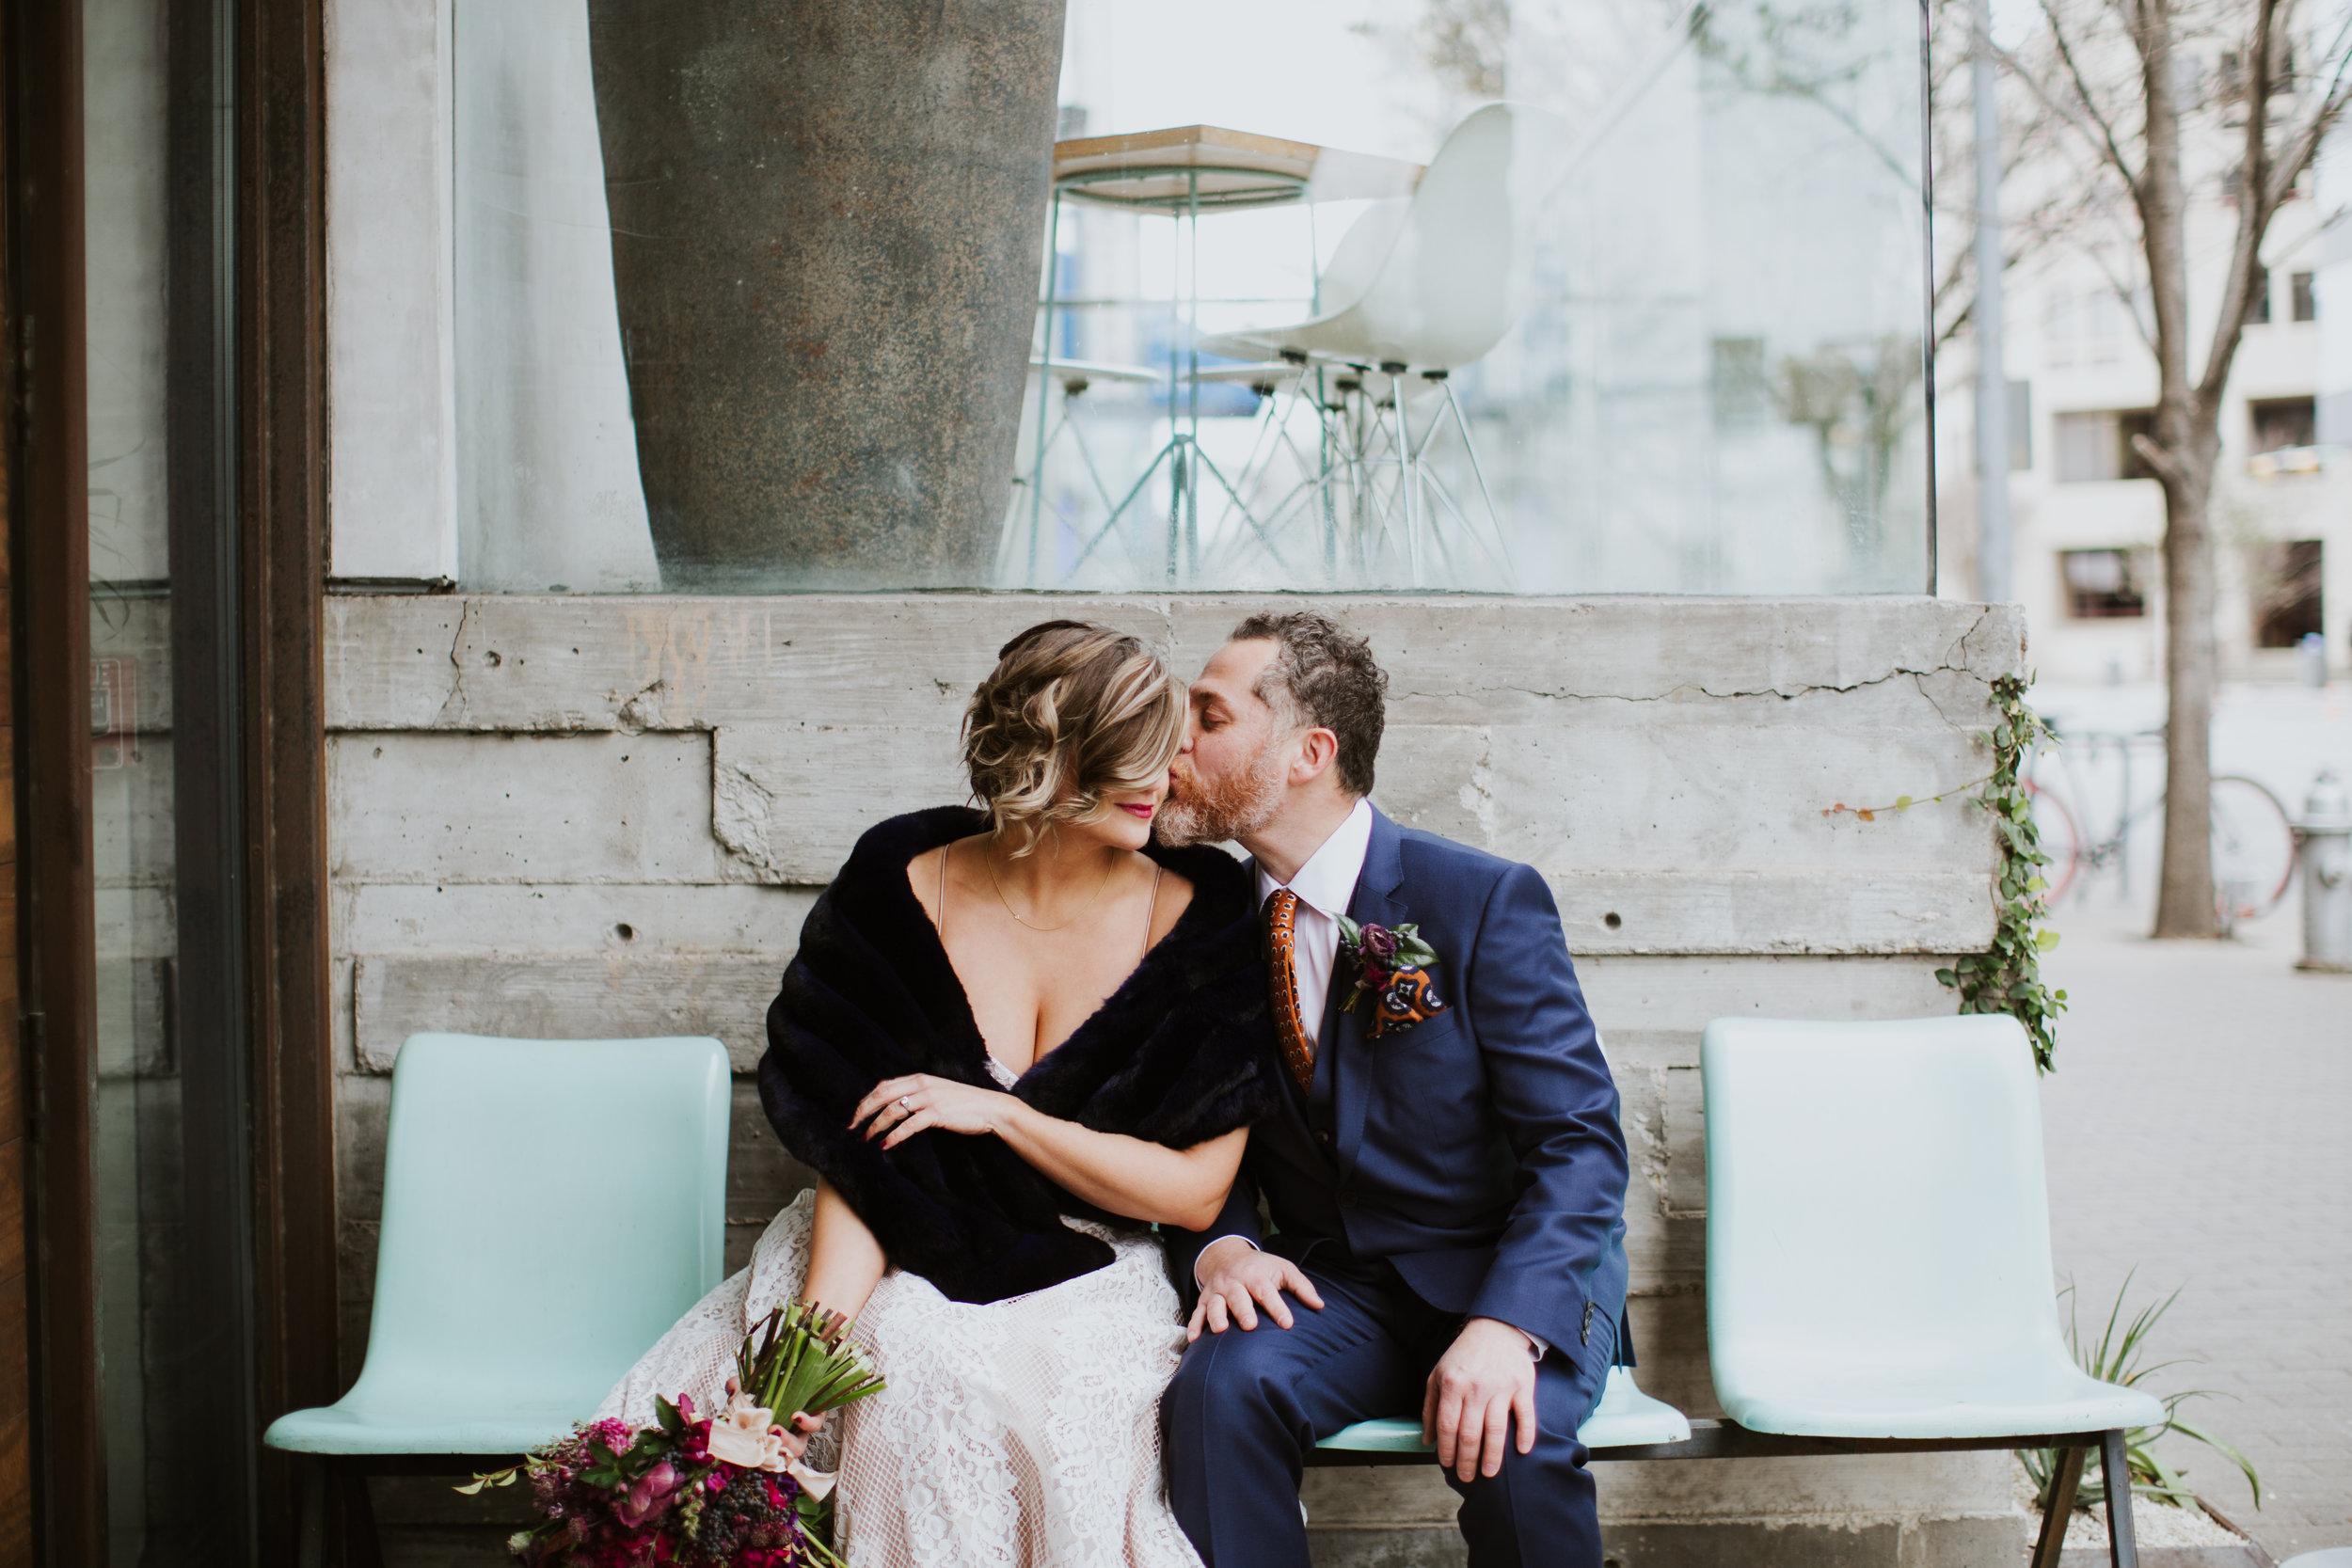 Paige-Newton-Destination-Wedding-Photography-La-Condesa.jpg